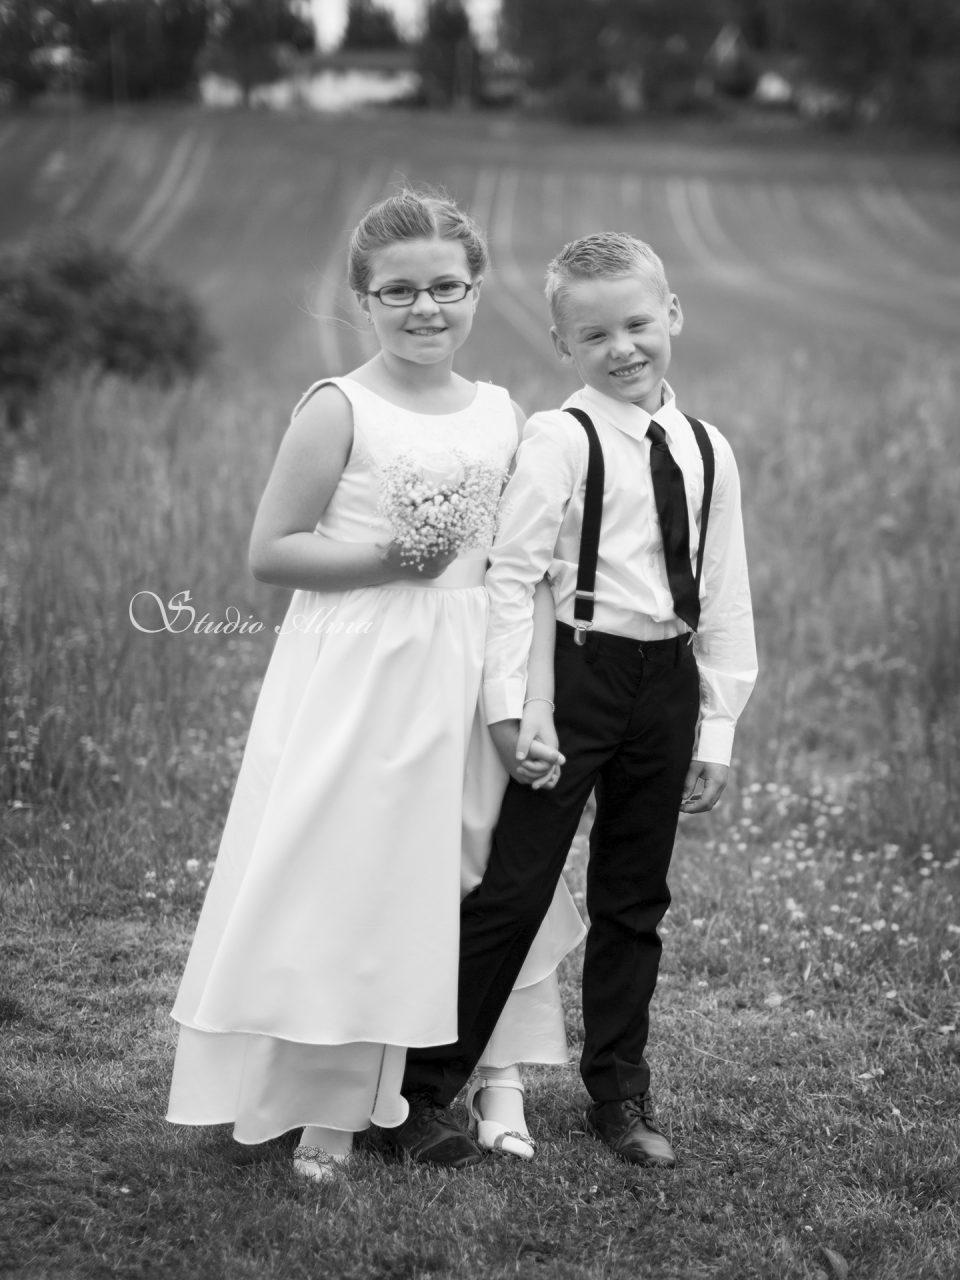 godevenner-studioalma-brudepike-brudesvenn